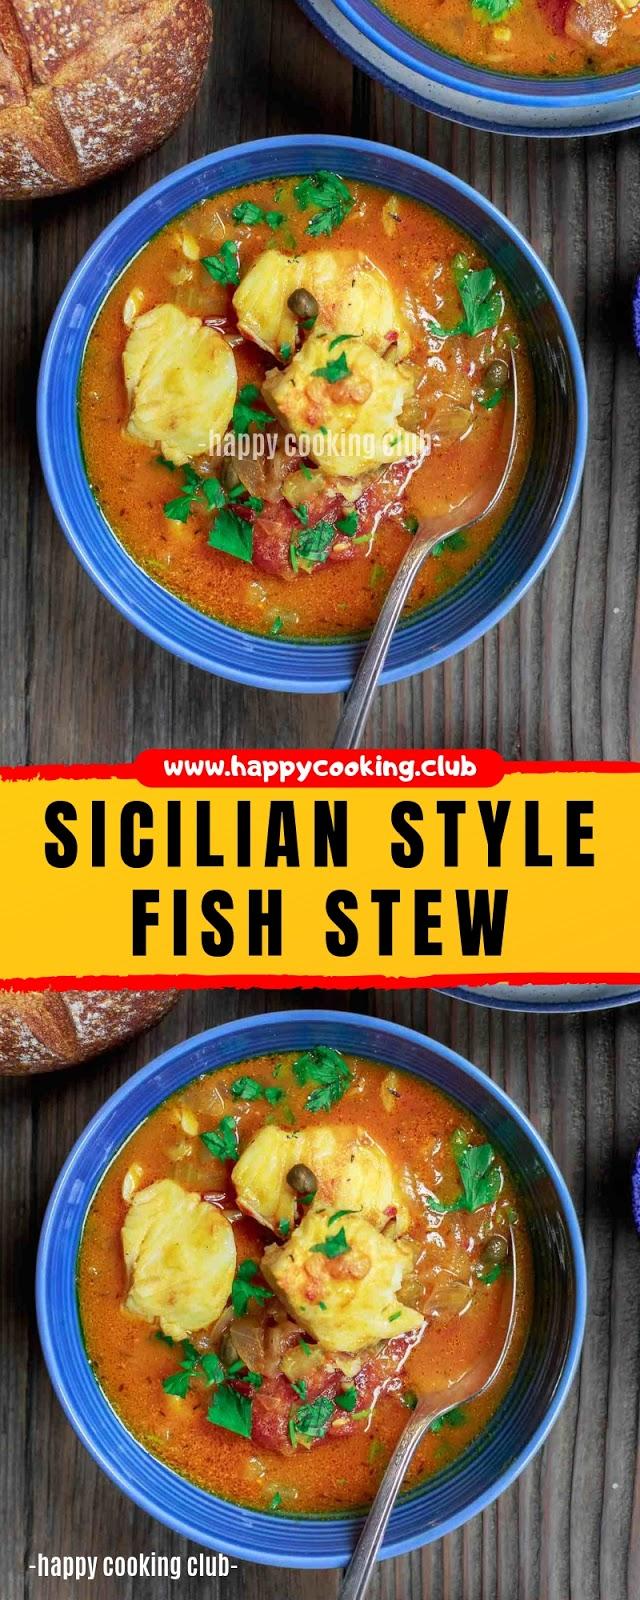 SICILIAN STYLE FISH STEW